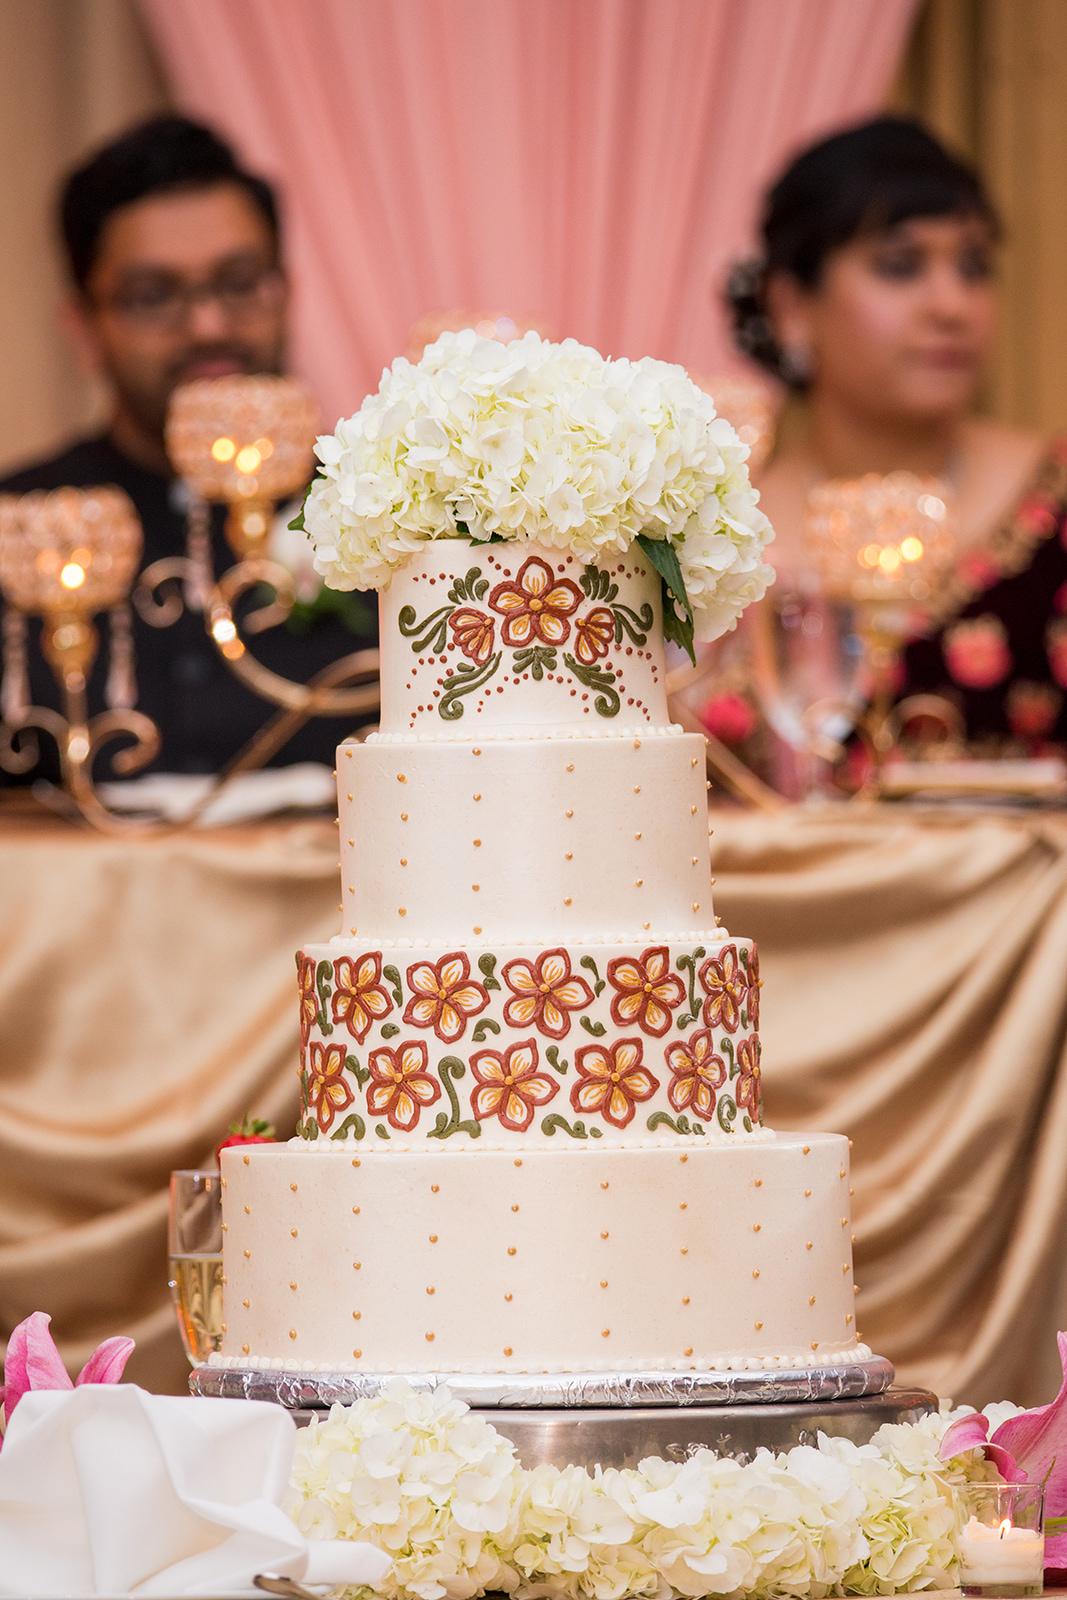 Le Cape Weddings - South Asian Wedding - Ishani and Sidhart - Wedding Reception-46.jpg